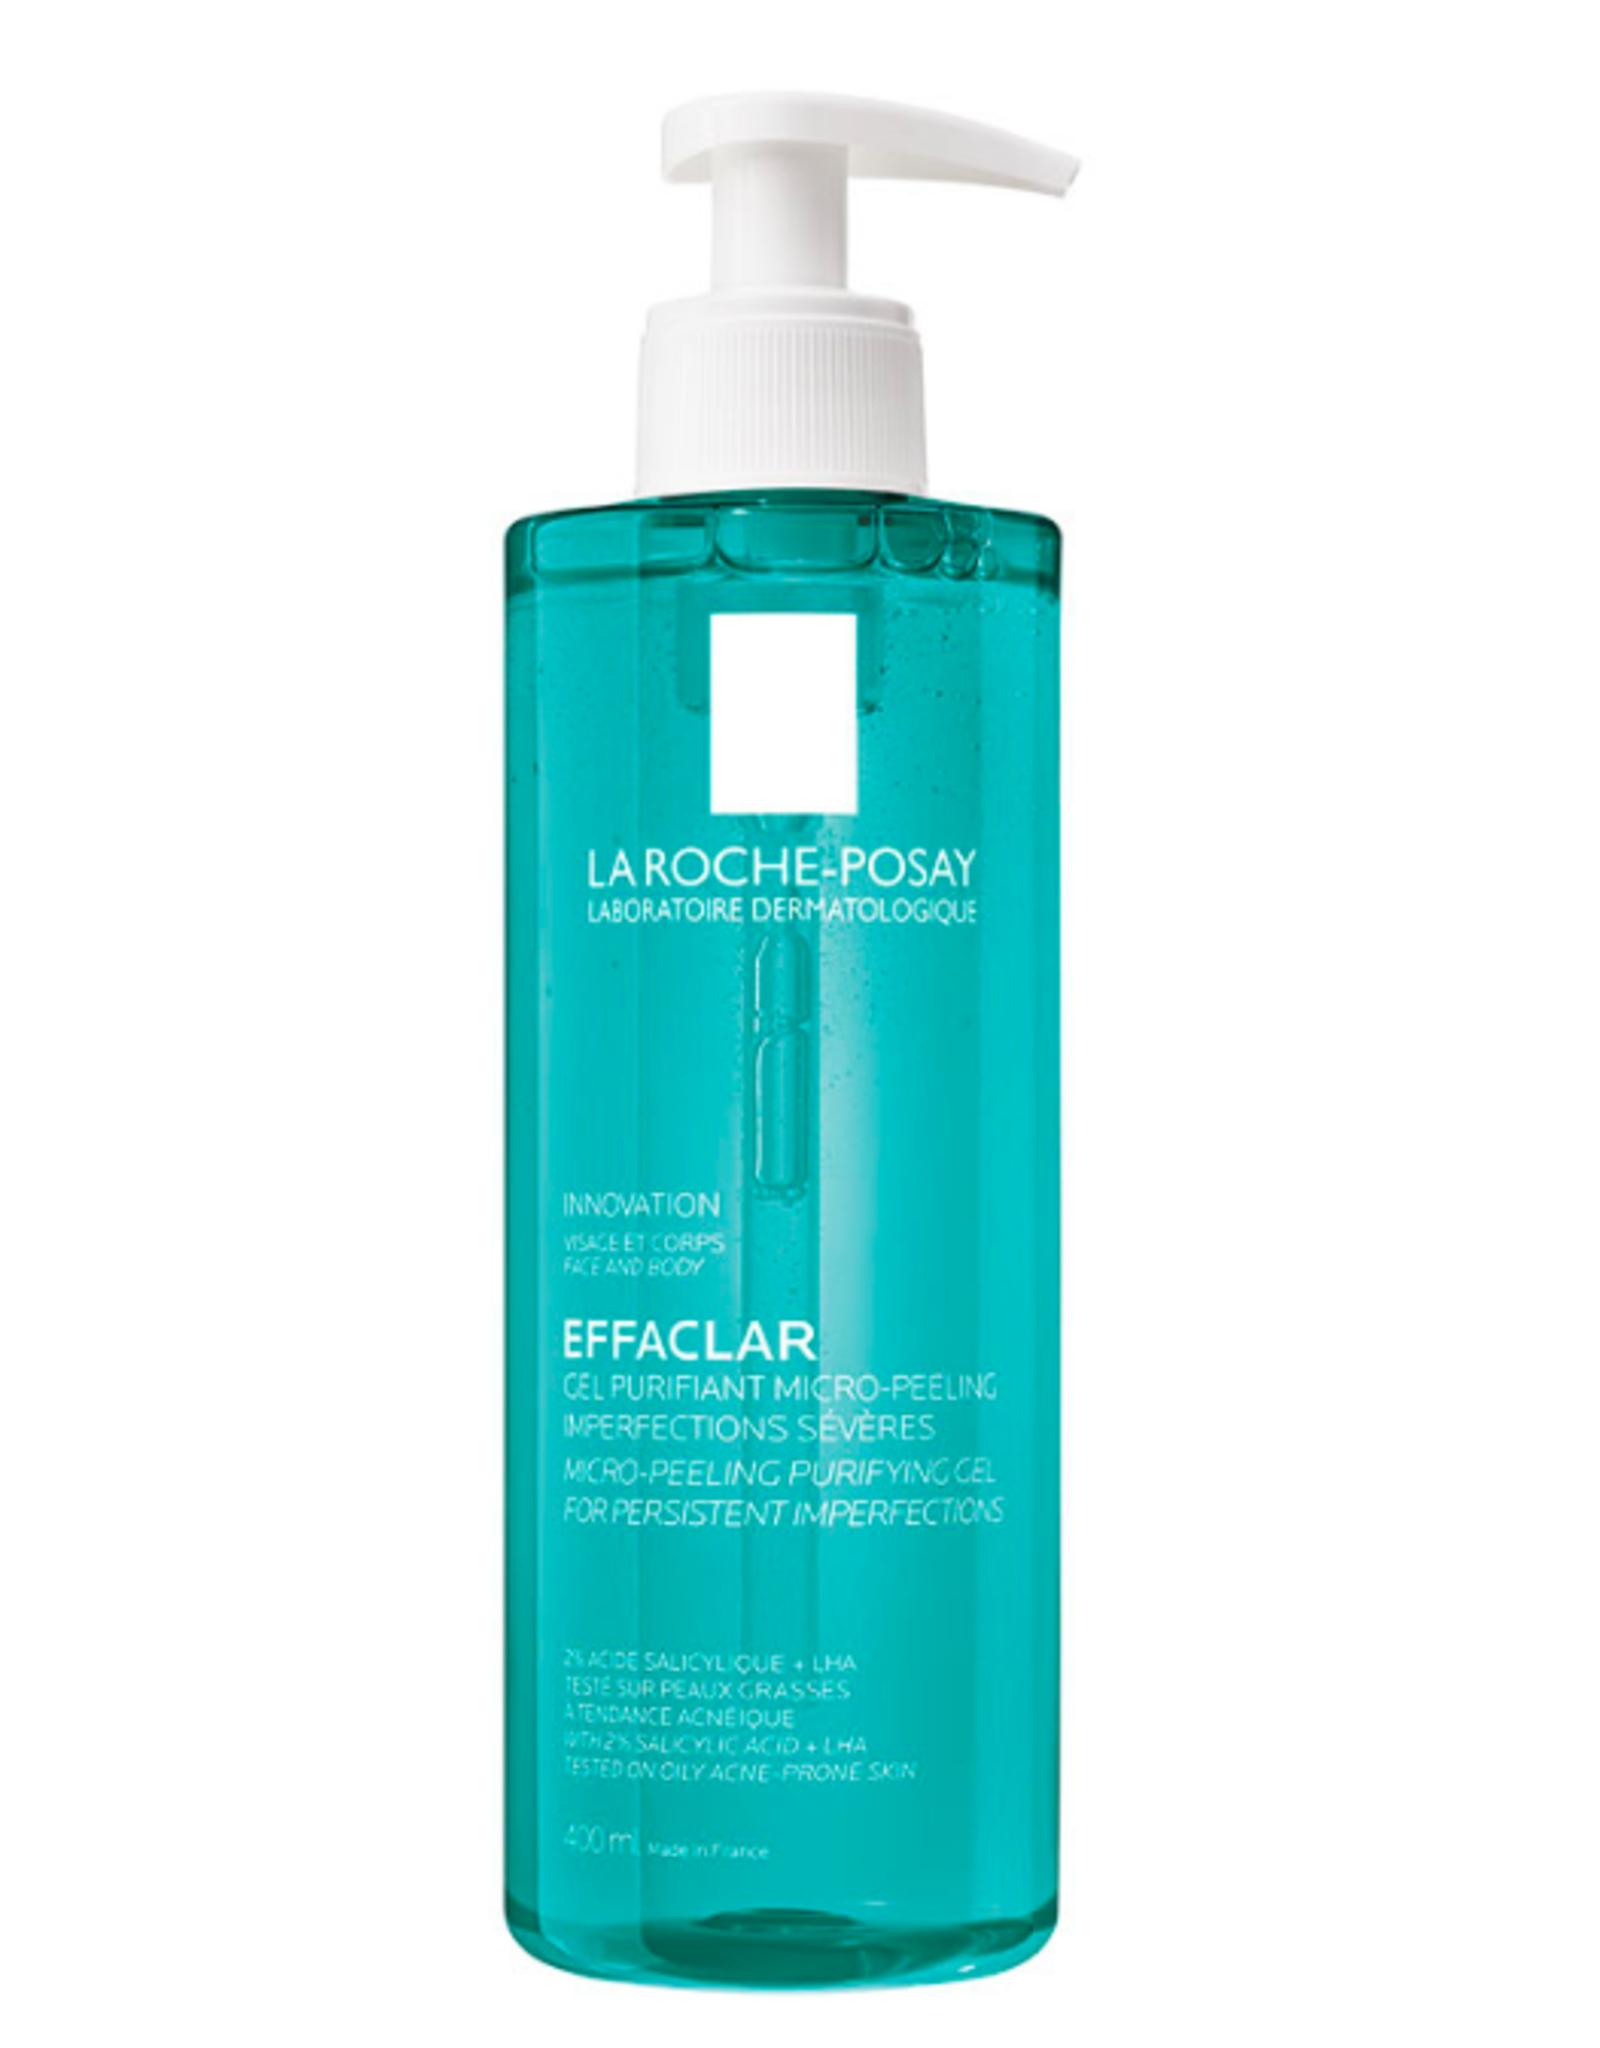 La Roche Posay Effaclar Zuiverende Micro-peeling Gel 400ml